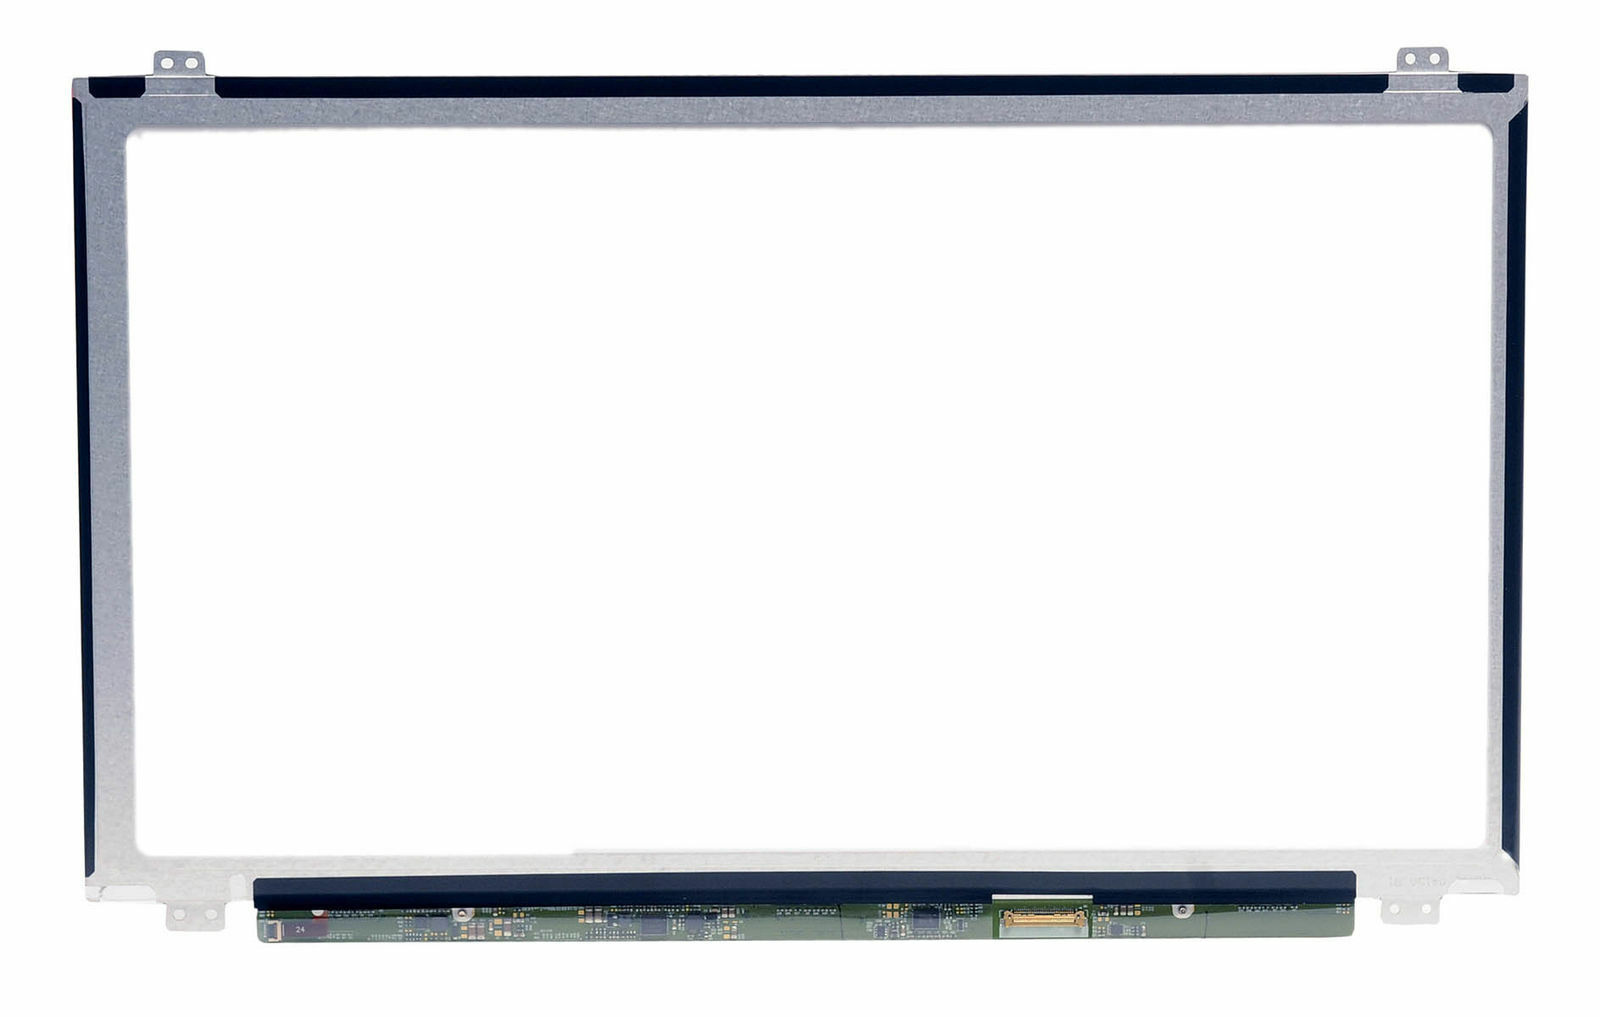 New SONY VAIO SVT15115CX SVT15112CXS SVT15114CXS Touch screen Glass Digitizer